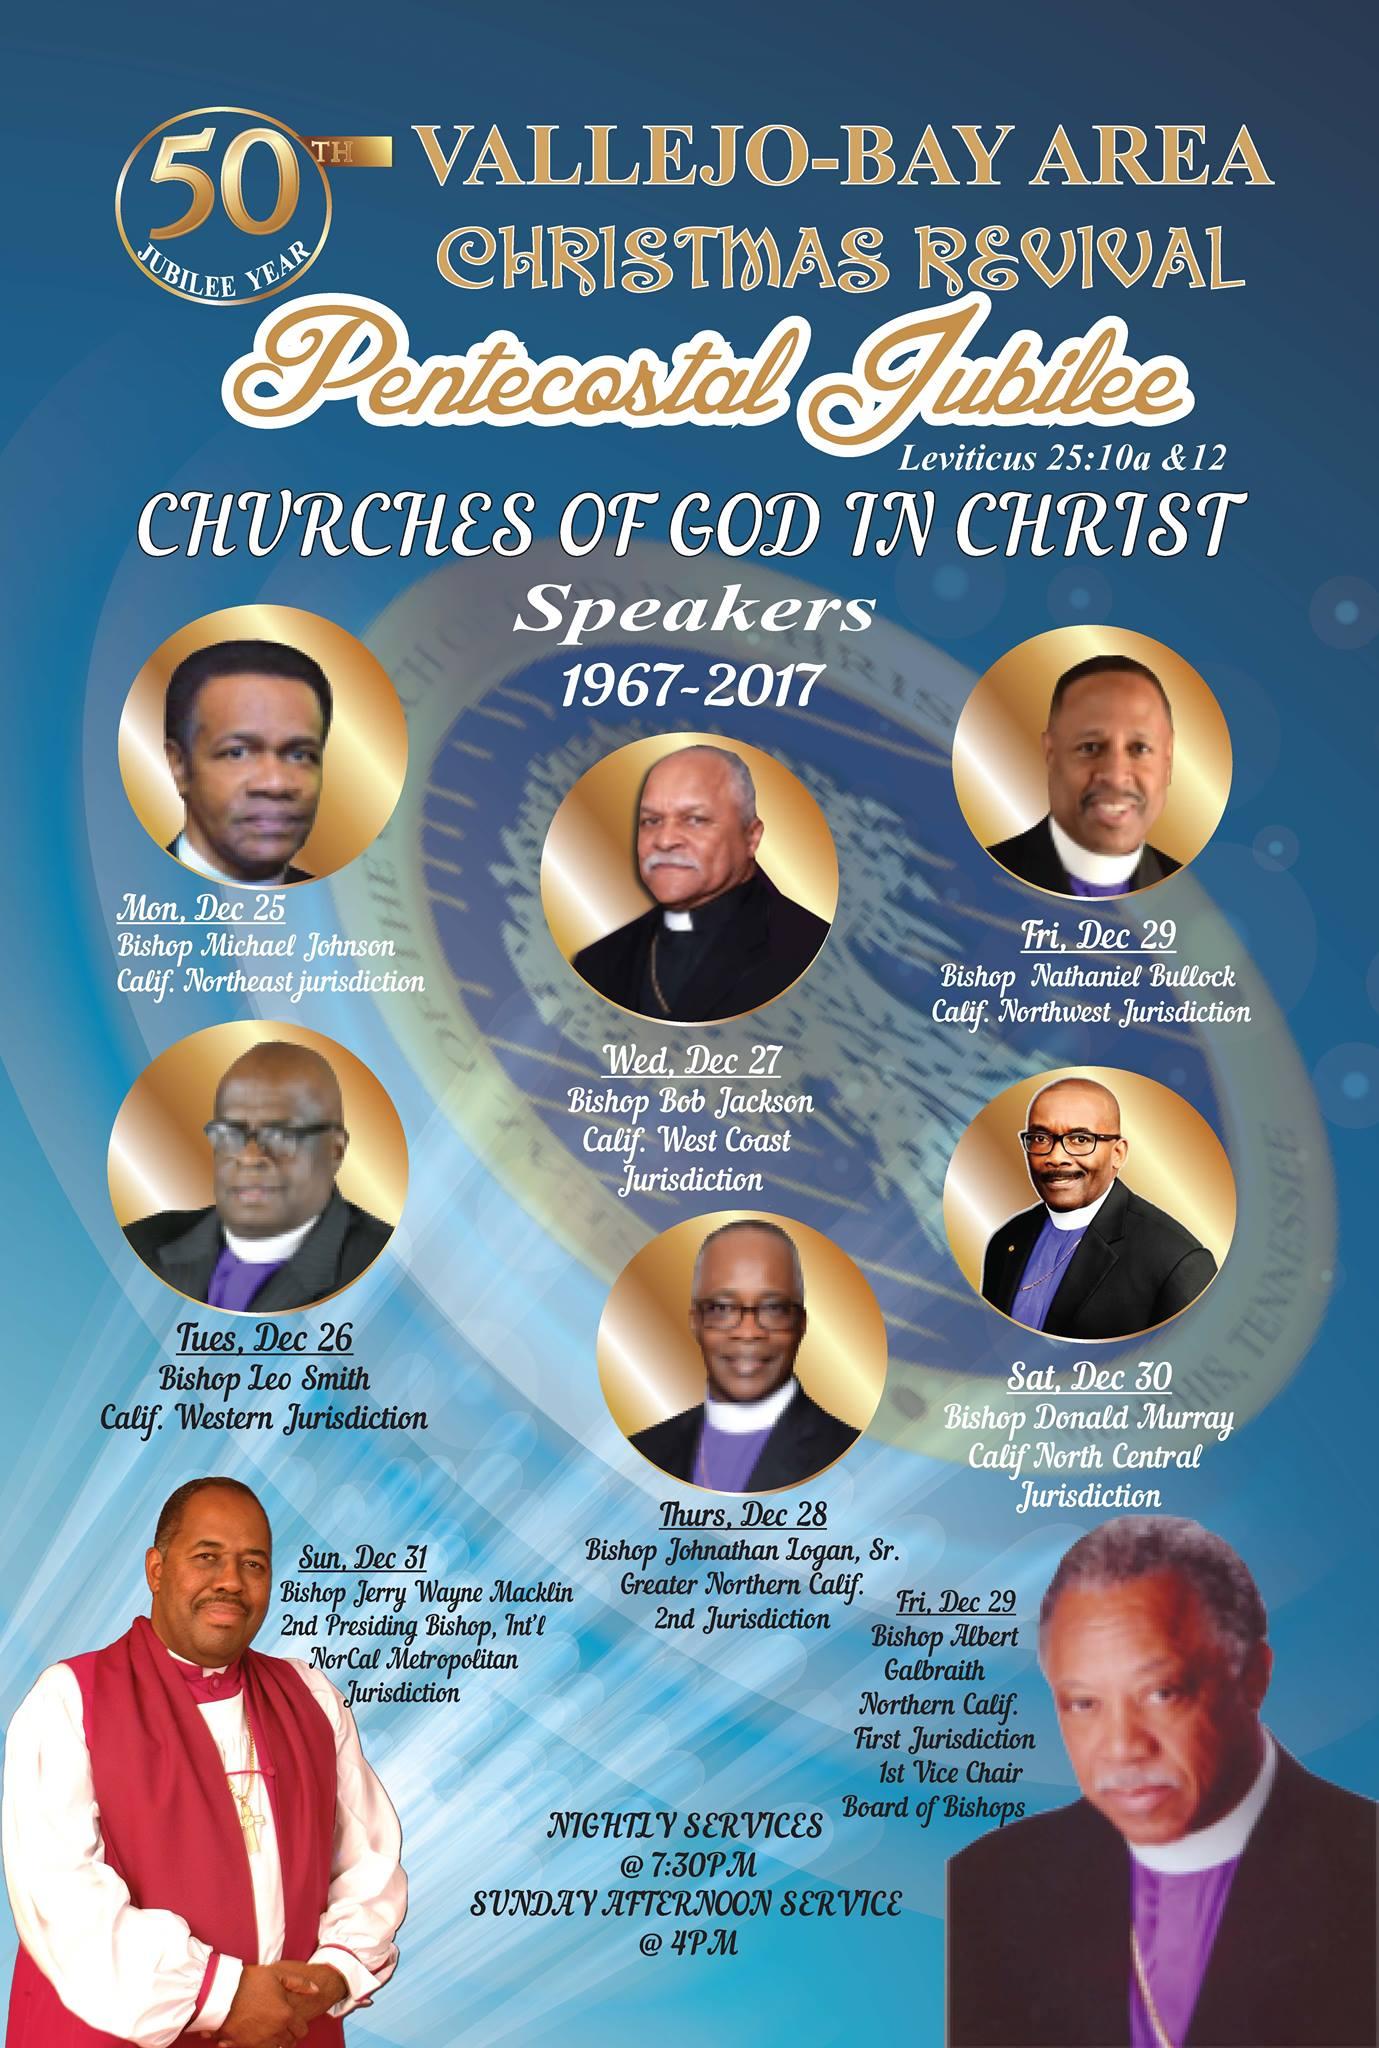 Pentecostal Jubilee: Vallejo - Bay Area Christmas Revival